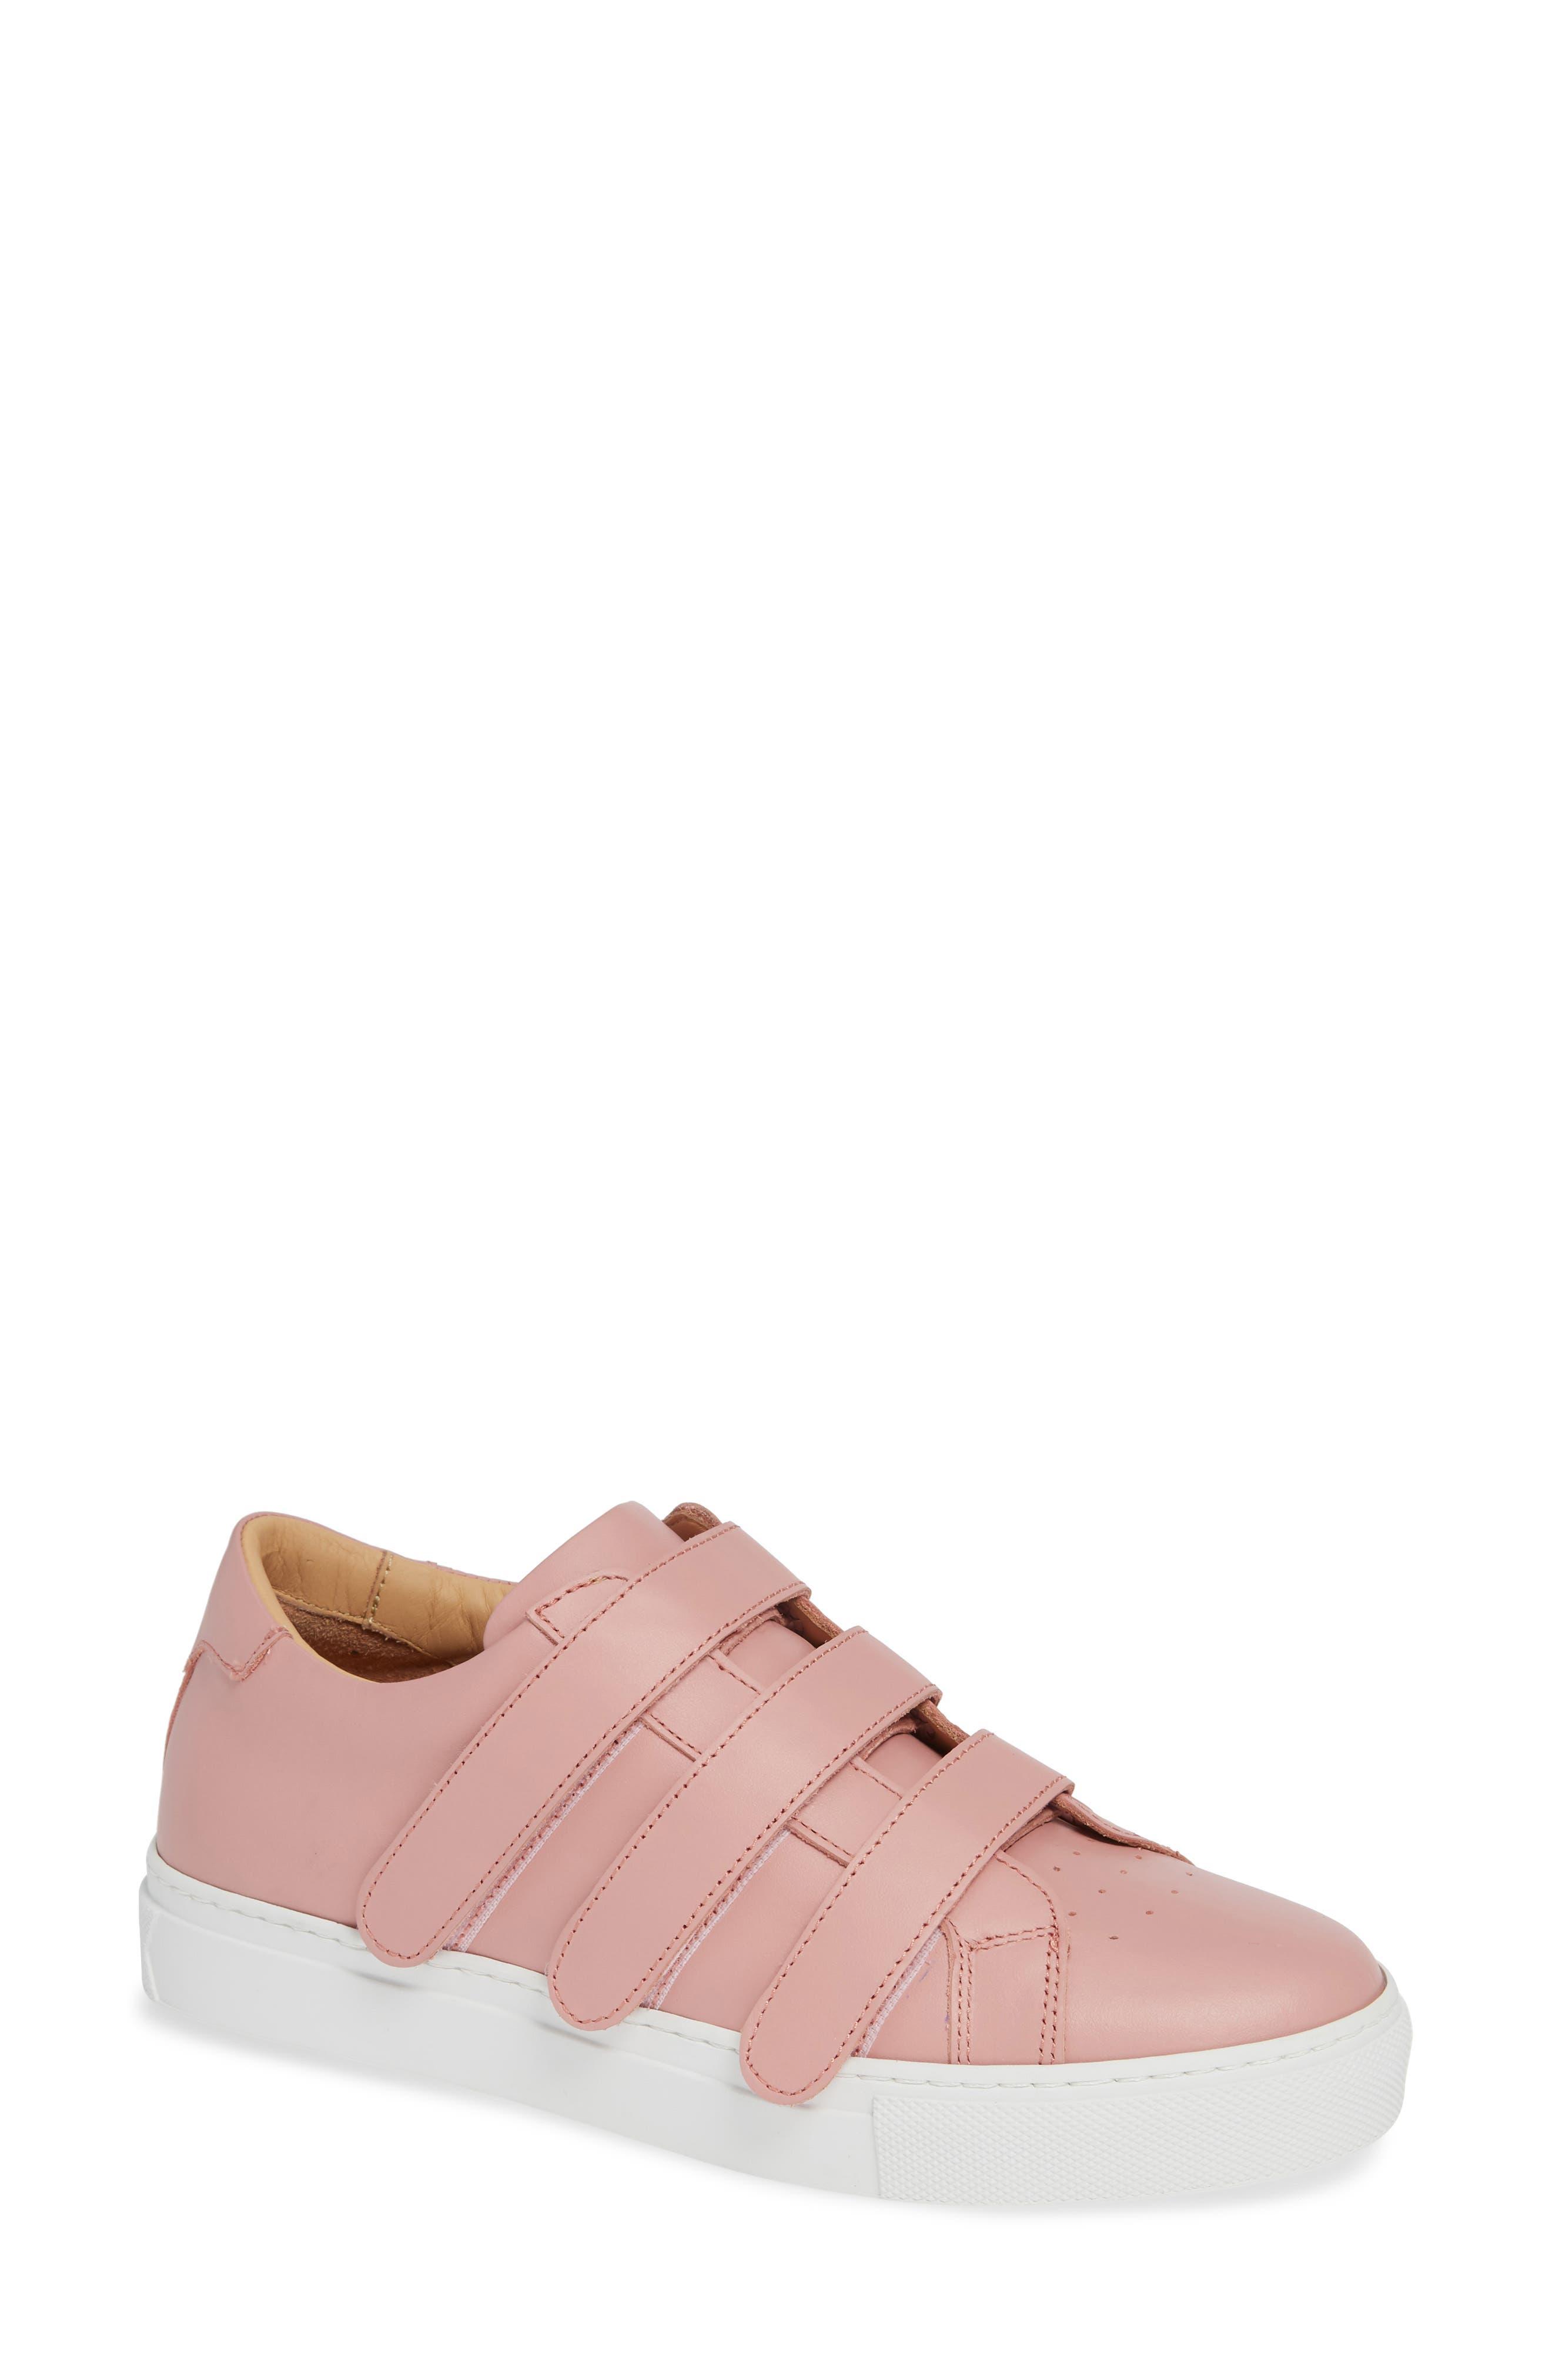 GREATS Royale Low Top Sneaker in Pink